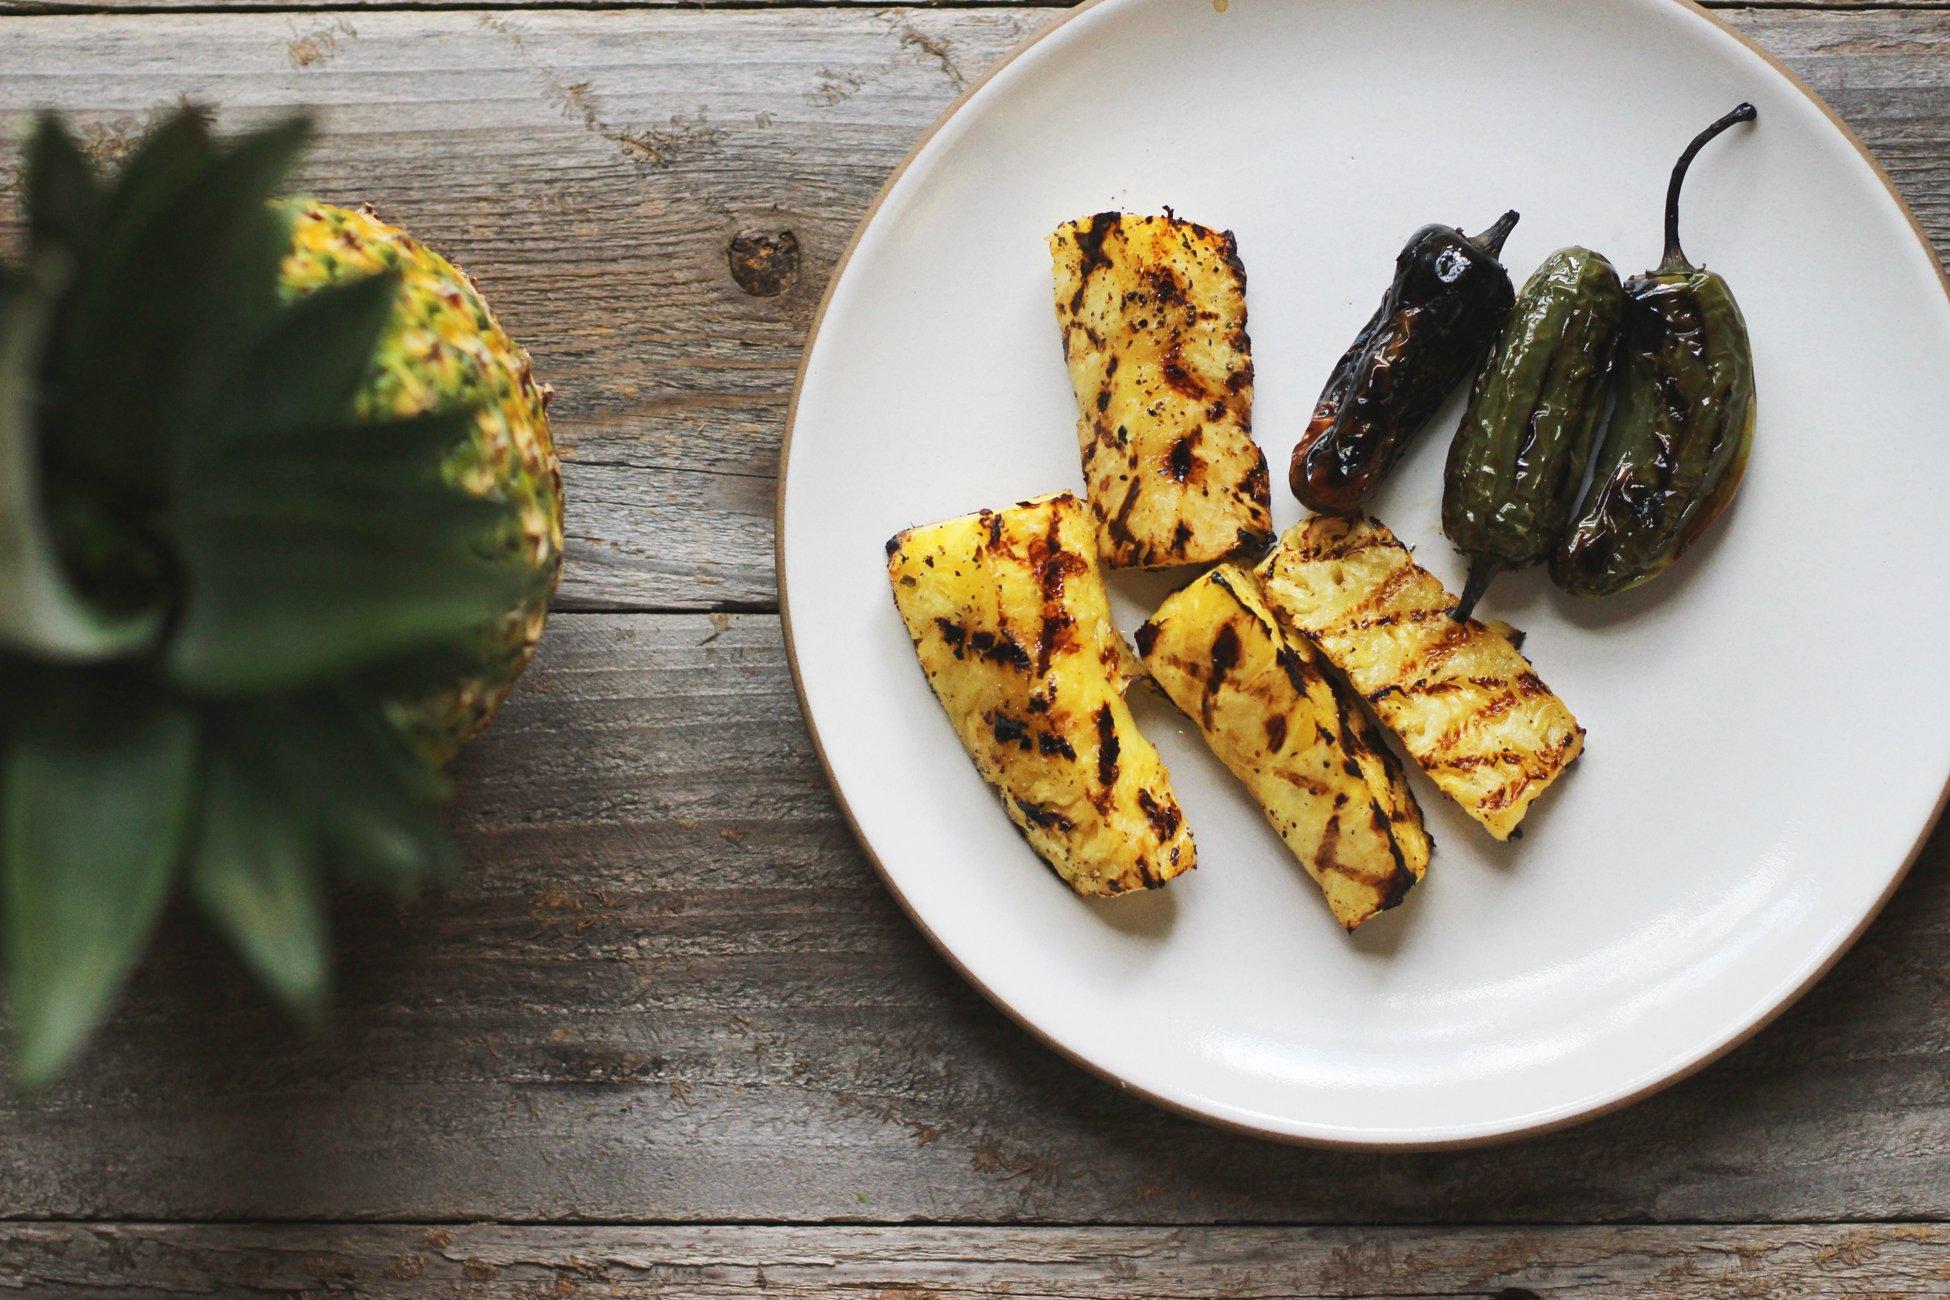 Cooking Pineapple the Brazilian Way